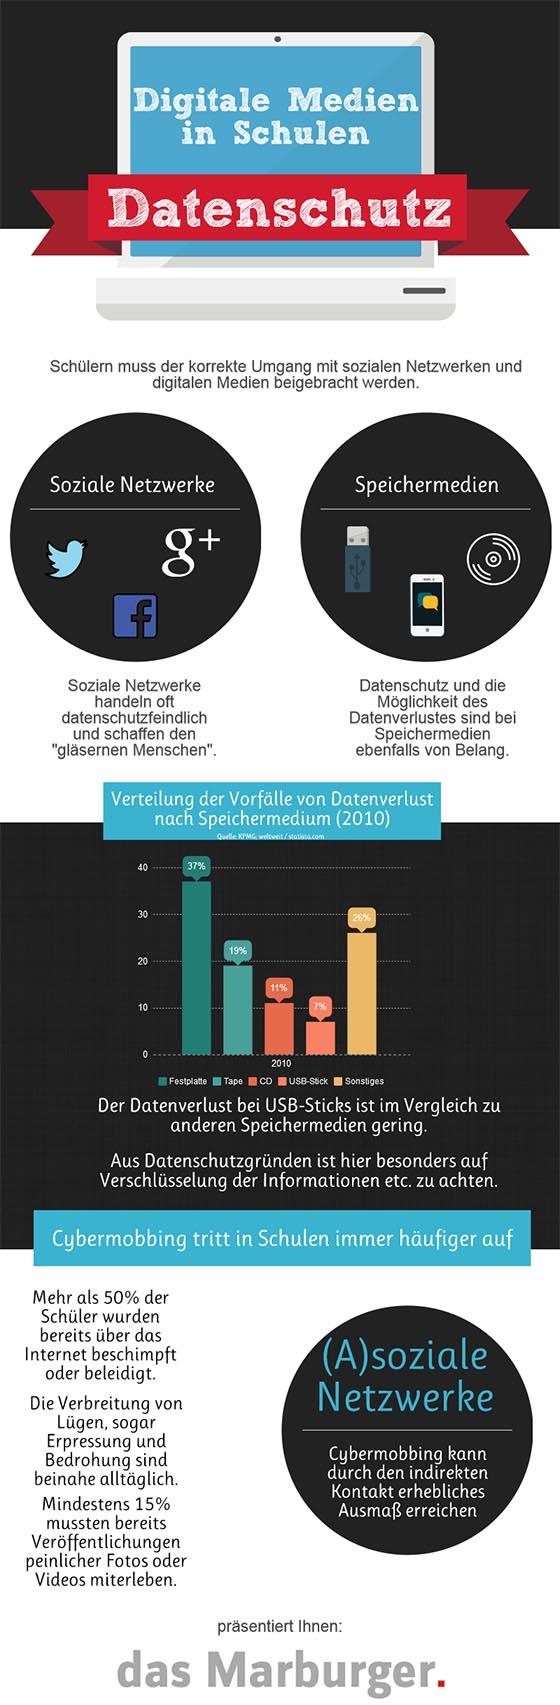 Infografik zu Digitalen Medien